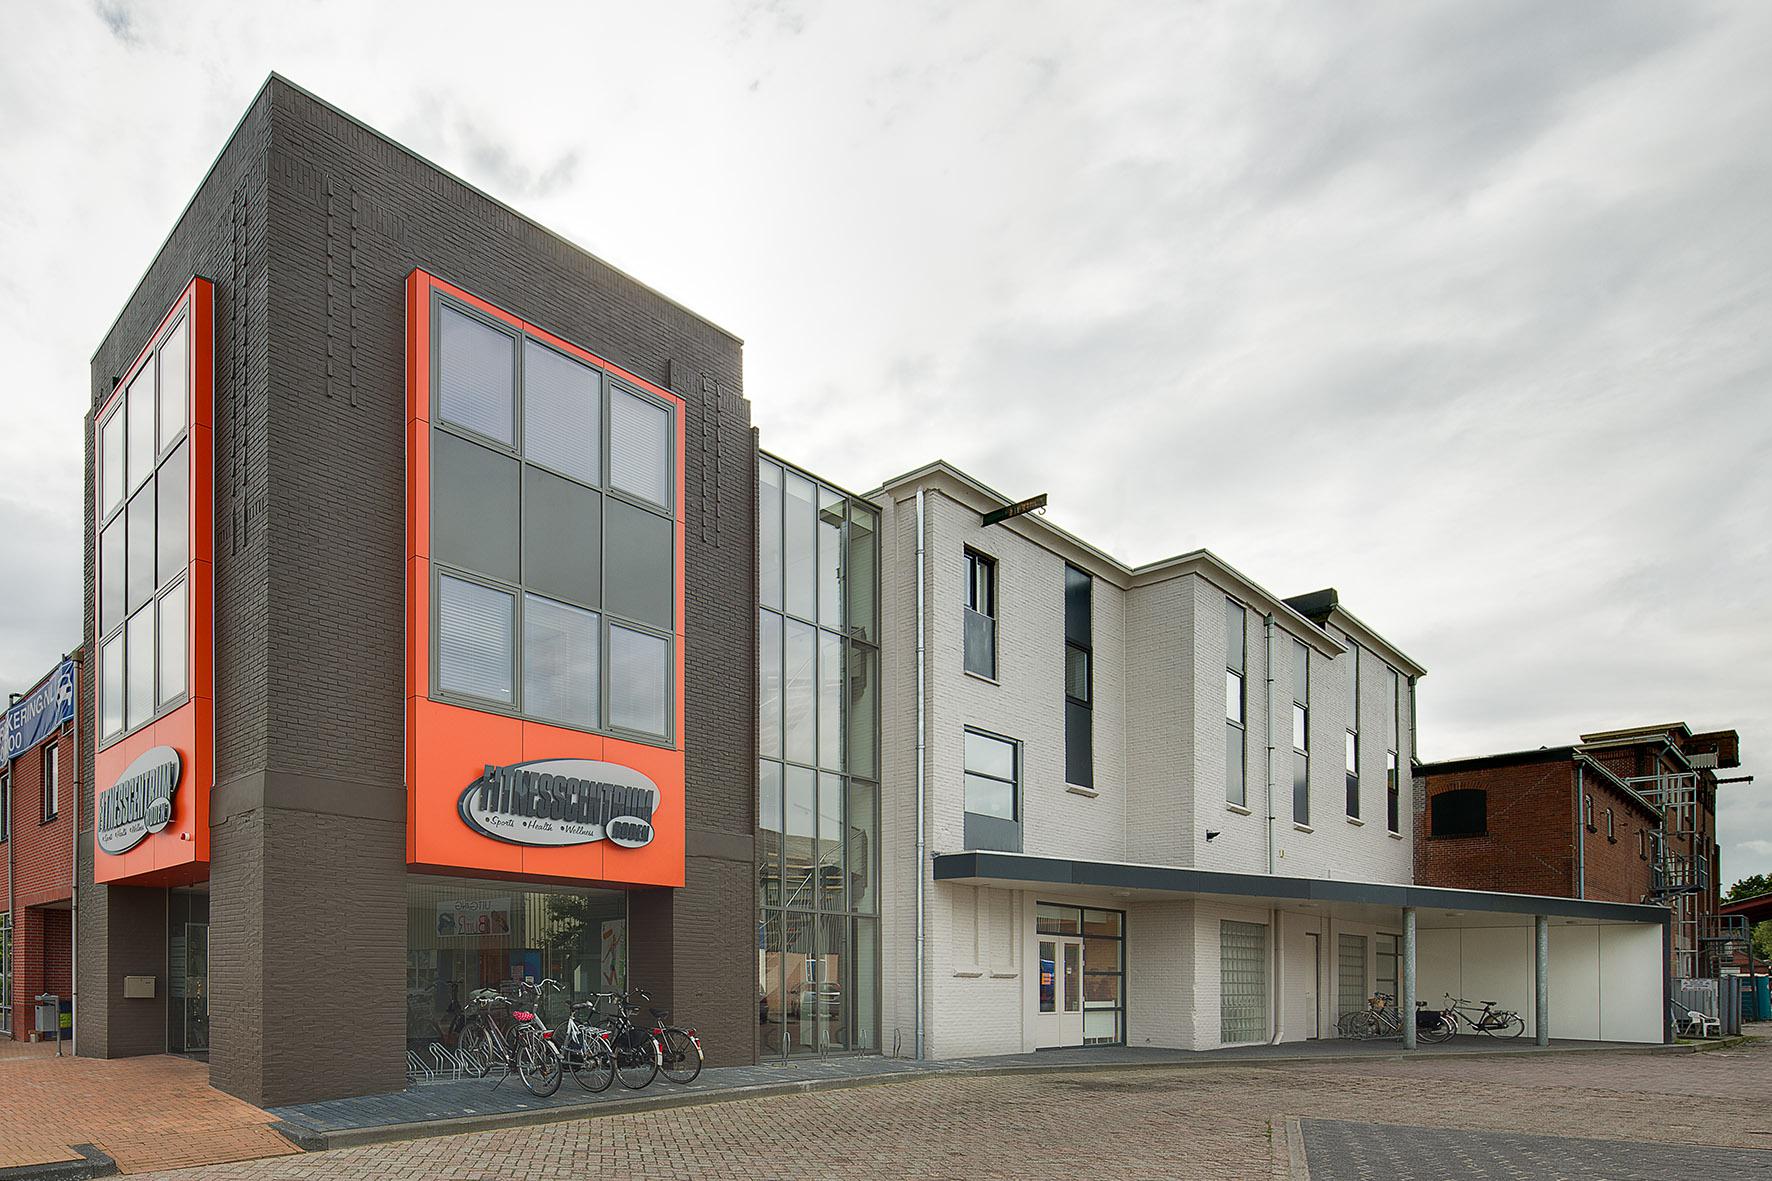 Fitnesscentrum Roden